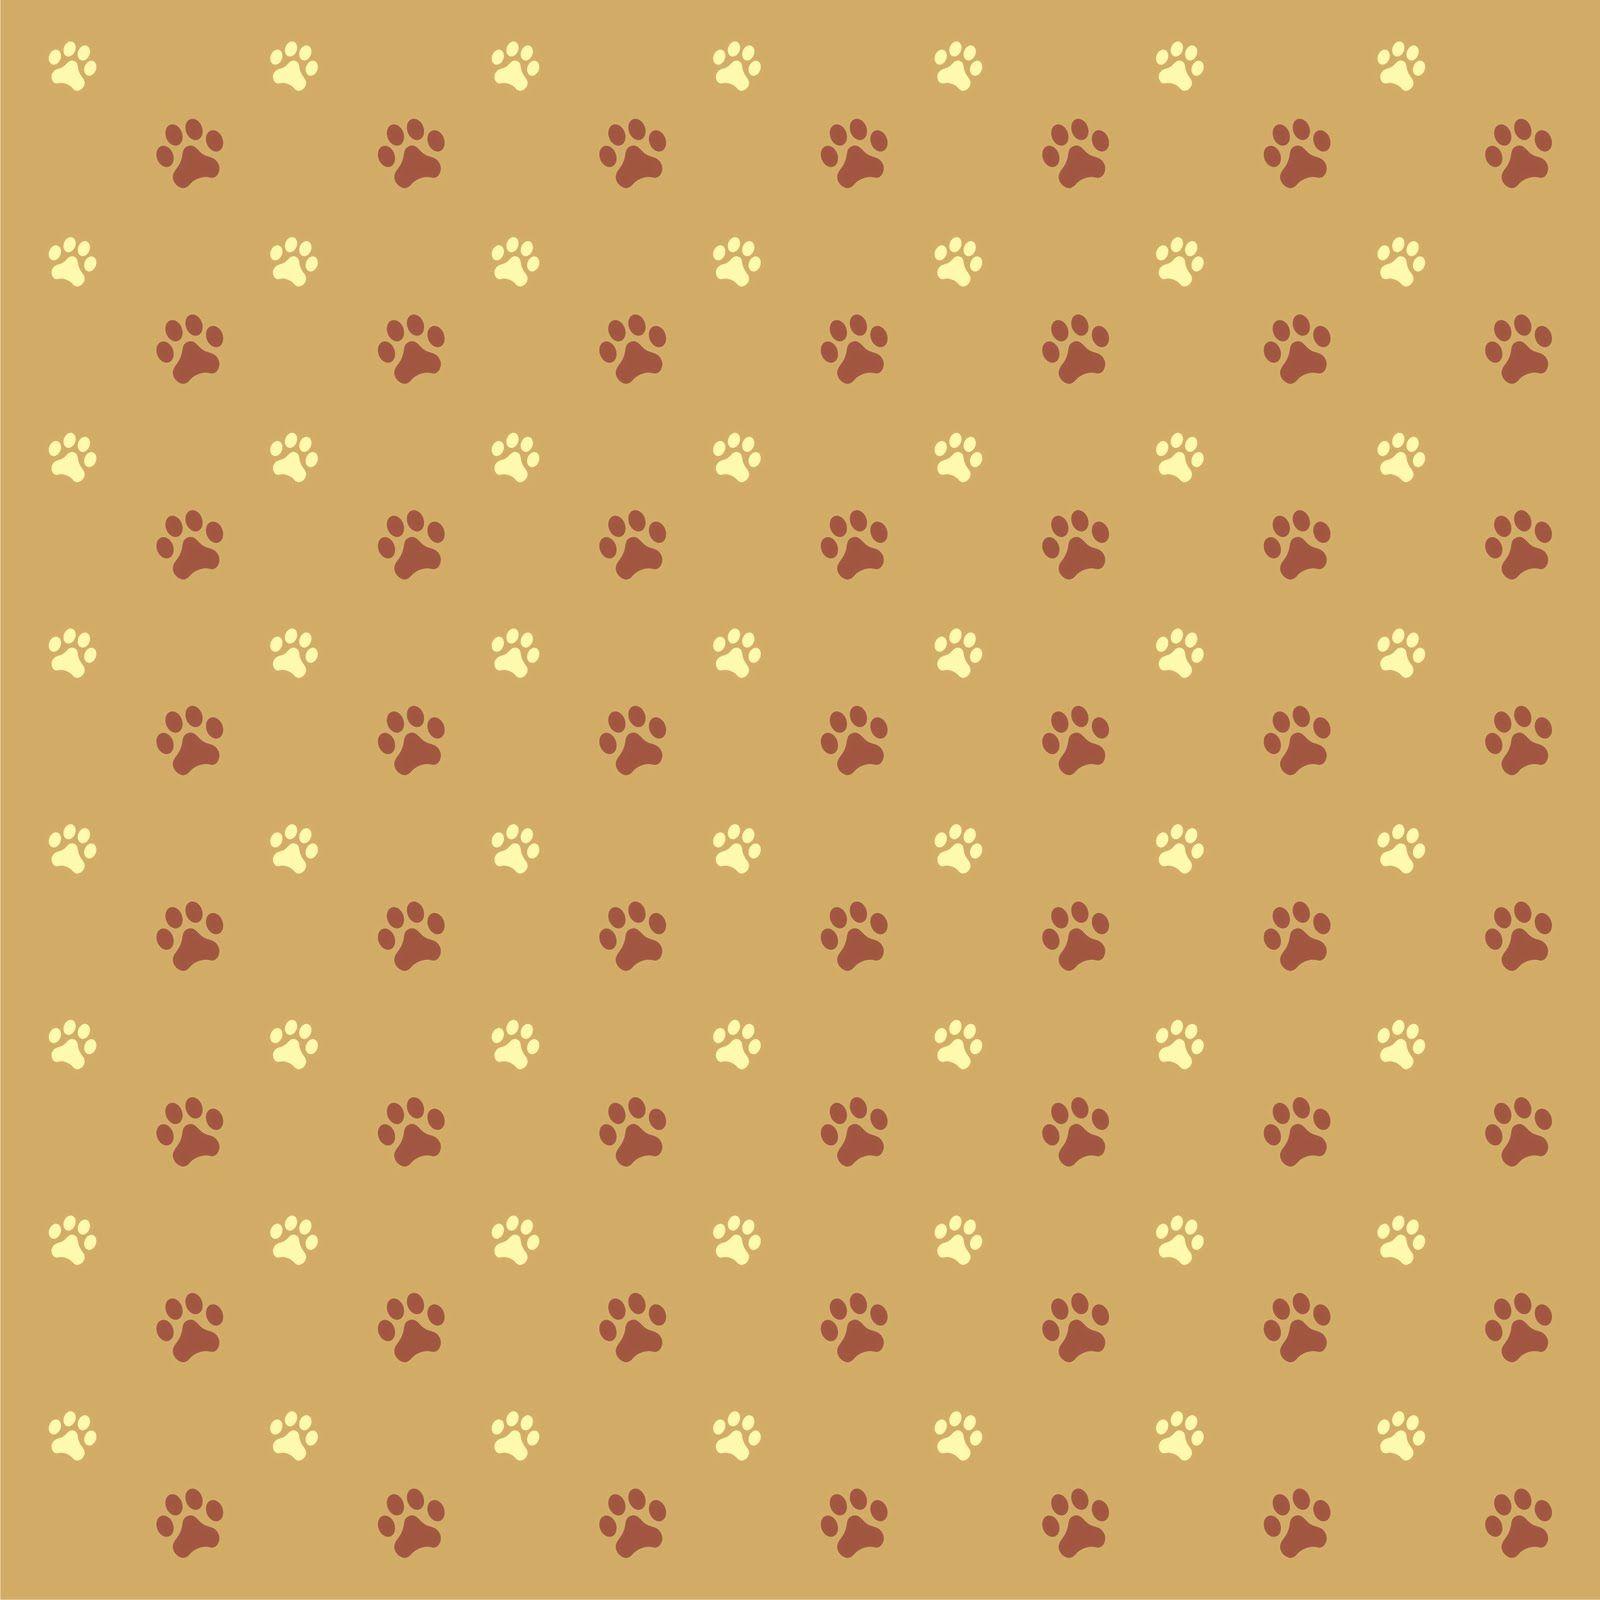 Free Paw Print Background.